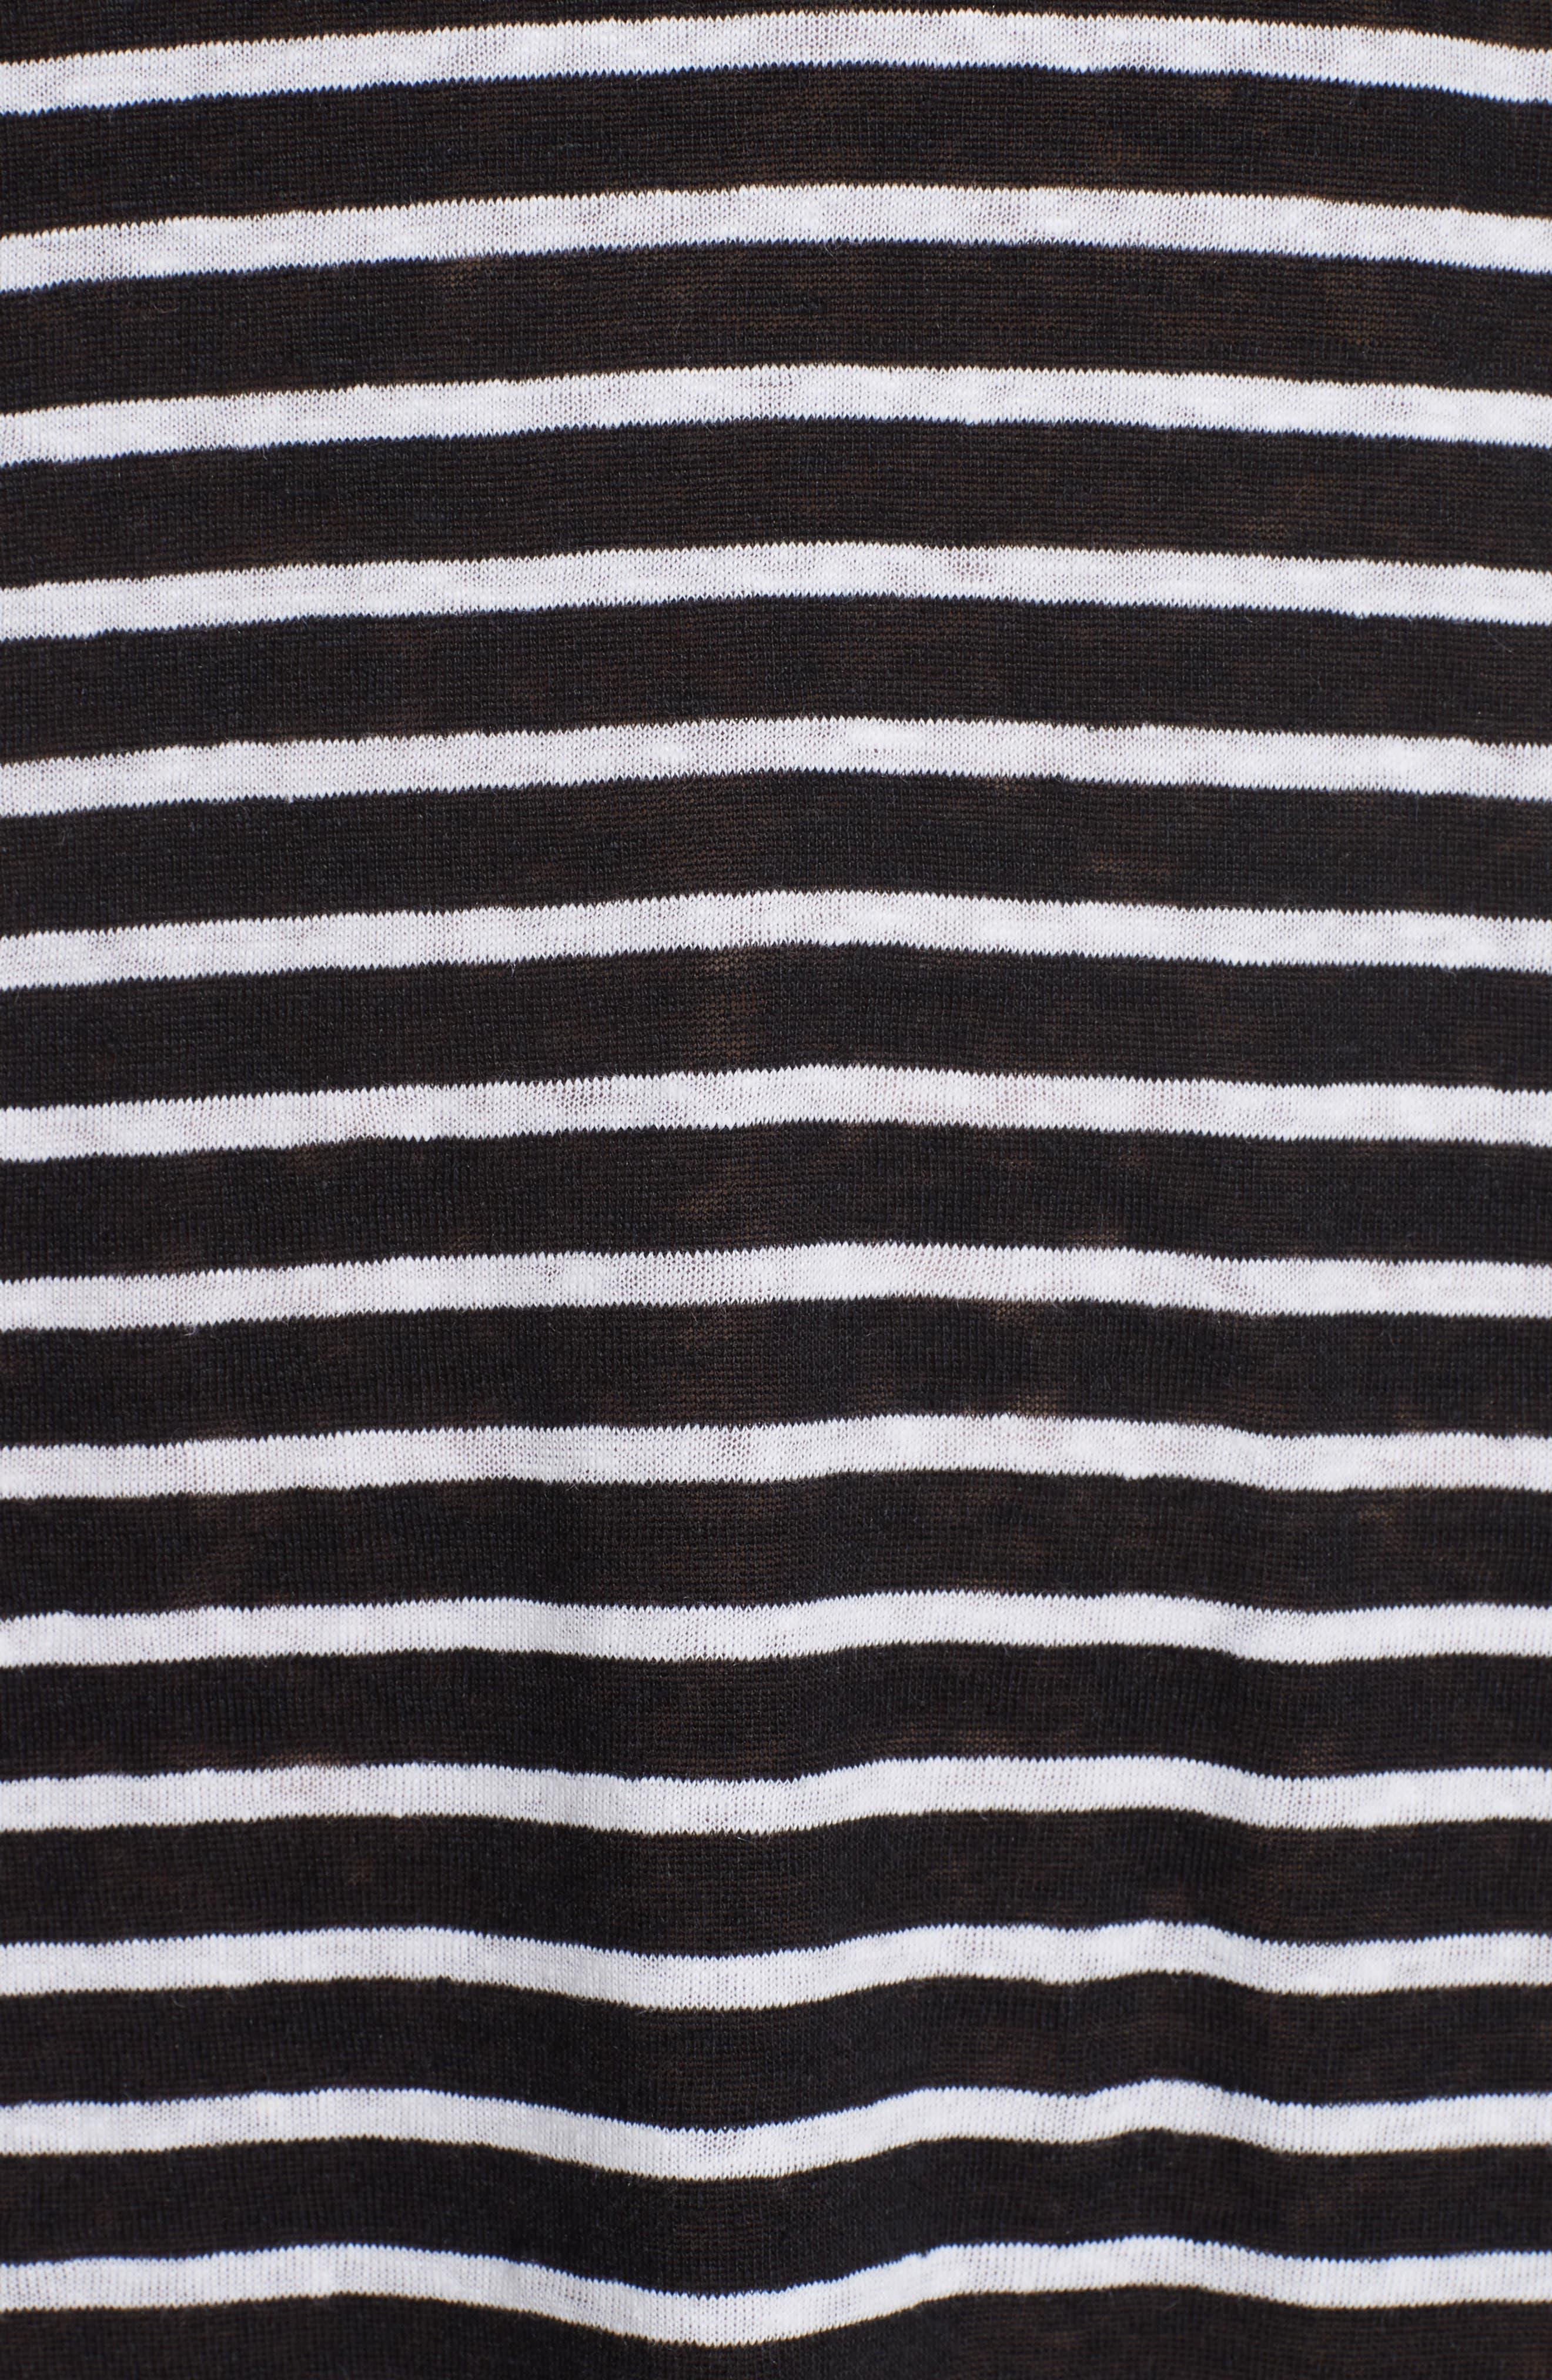 Stripe Organic Linen Knit Shift Dress,                             Alternate thumbnail 5, color,                             Black/ White